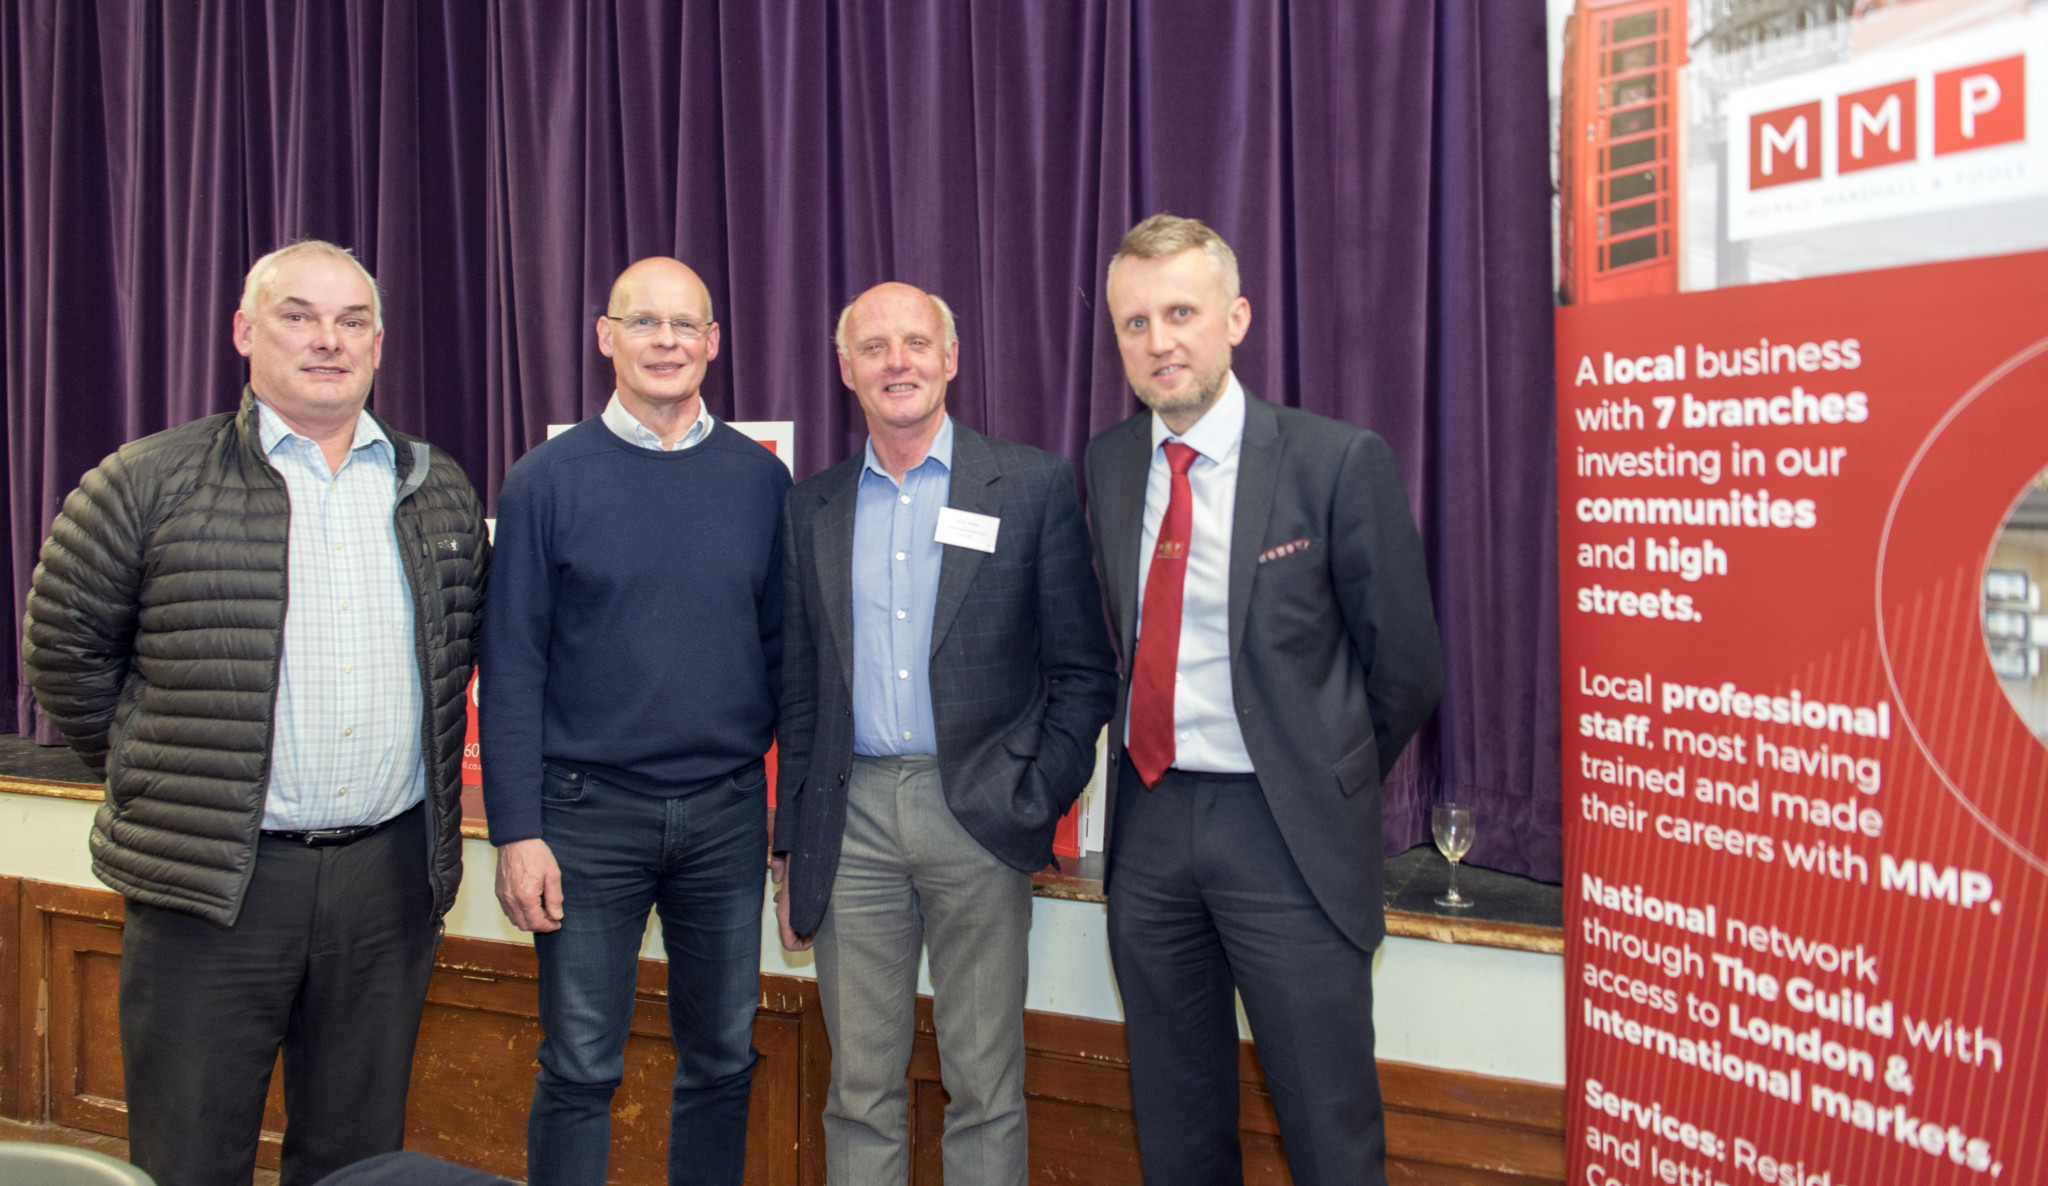 2018 Montgomeryshire Village Award launched